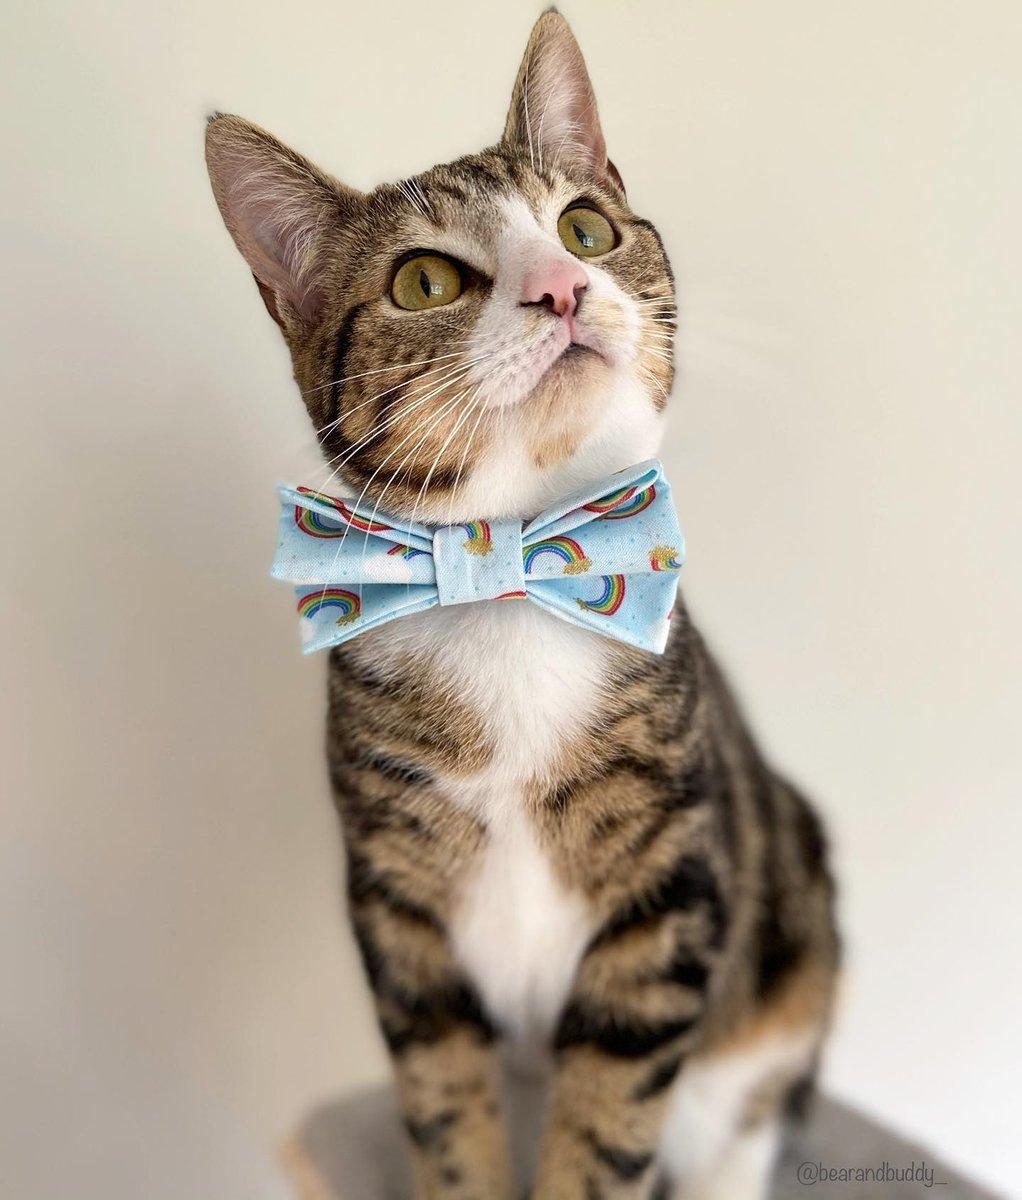 🐱 Happy Sunday from Buddy, Hope you have a lovely day!  📷 @bearandbuddy_  #petclubsa #meowed #cat #catsofinstagram #kitten #kitty #tabbycat #tabby #tabbycatsofinstagram #tabbiesofinstagram #tabbies #tabbiesofig  📍 Northern Ireland https://t.co/mUVDQVAUF8